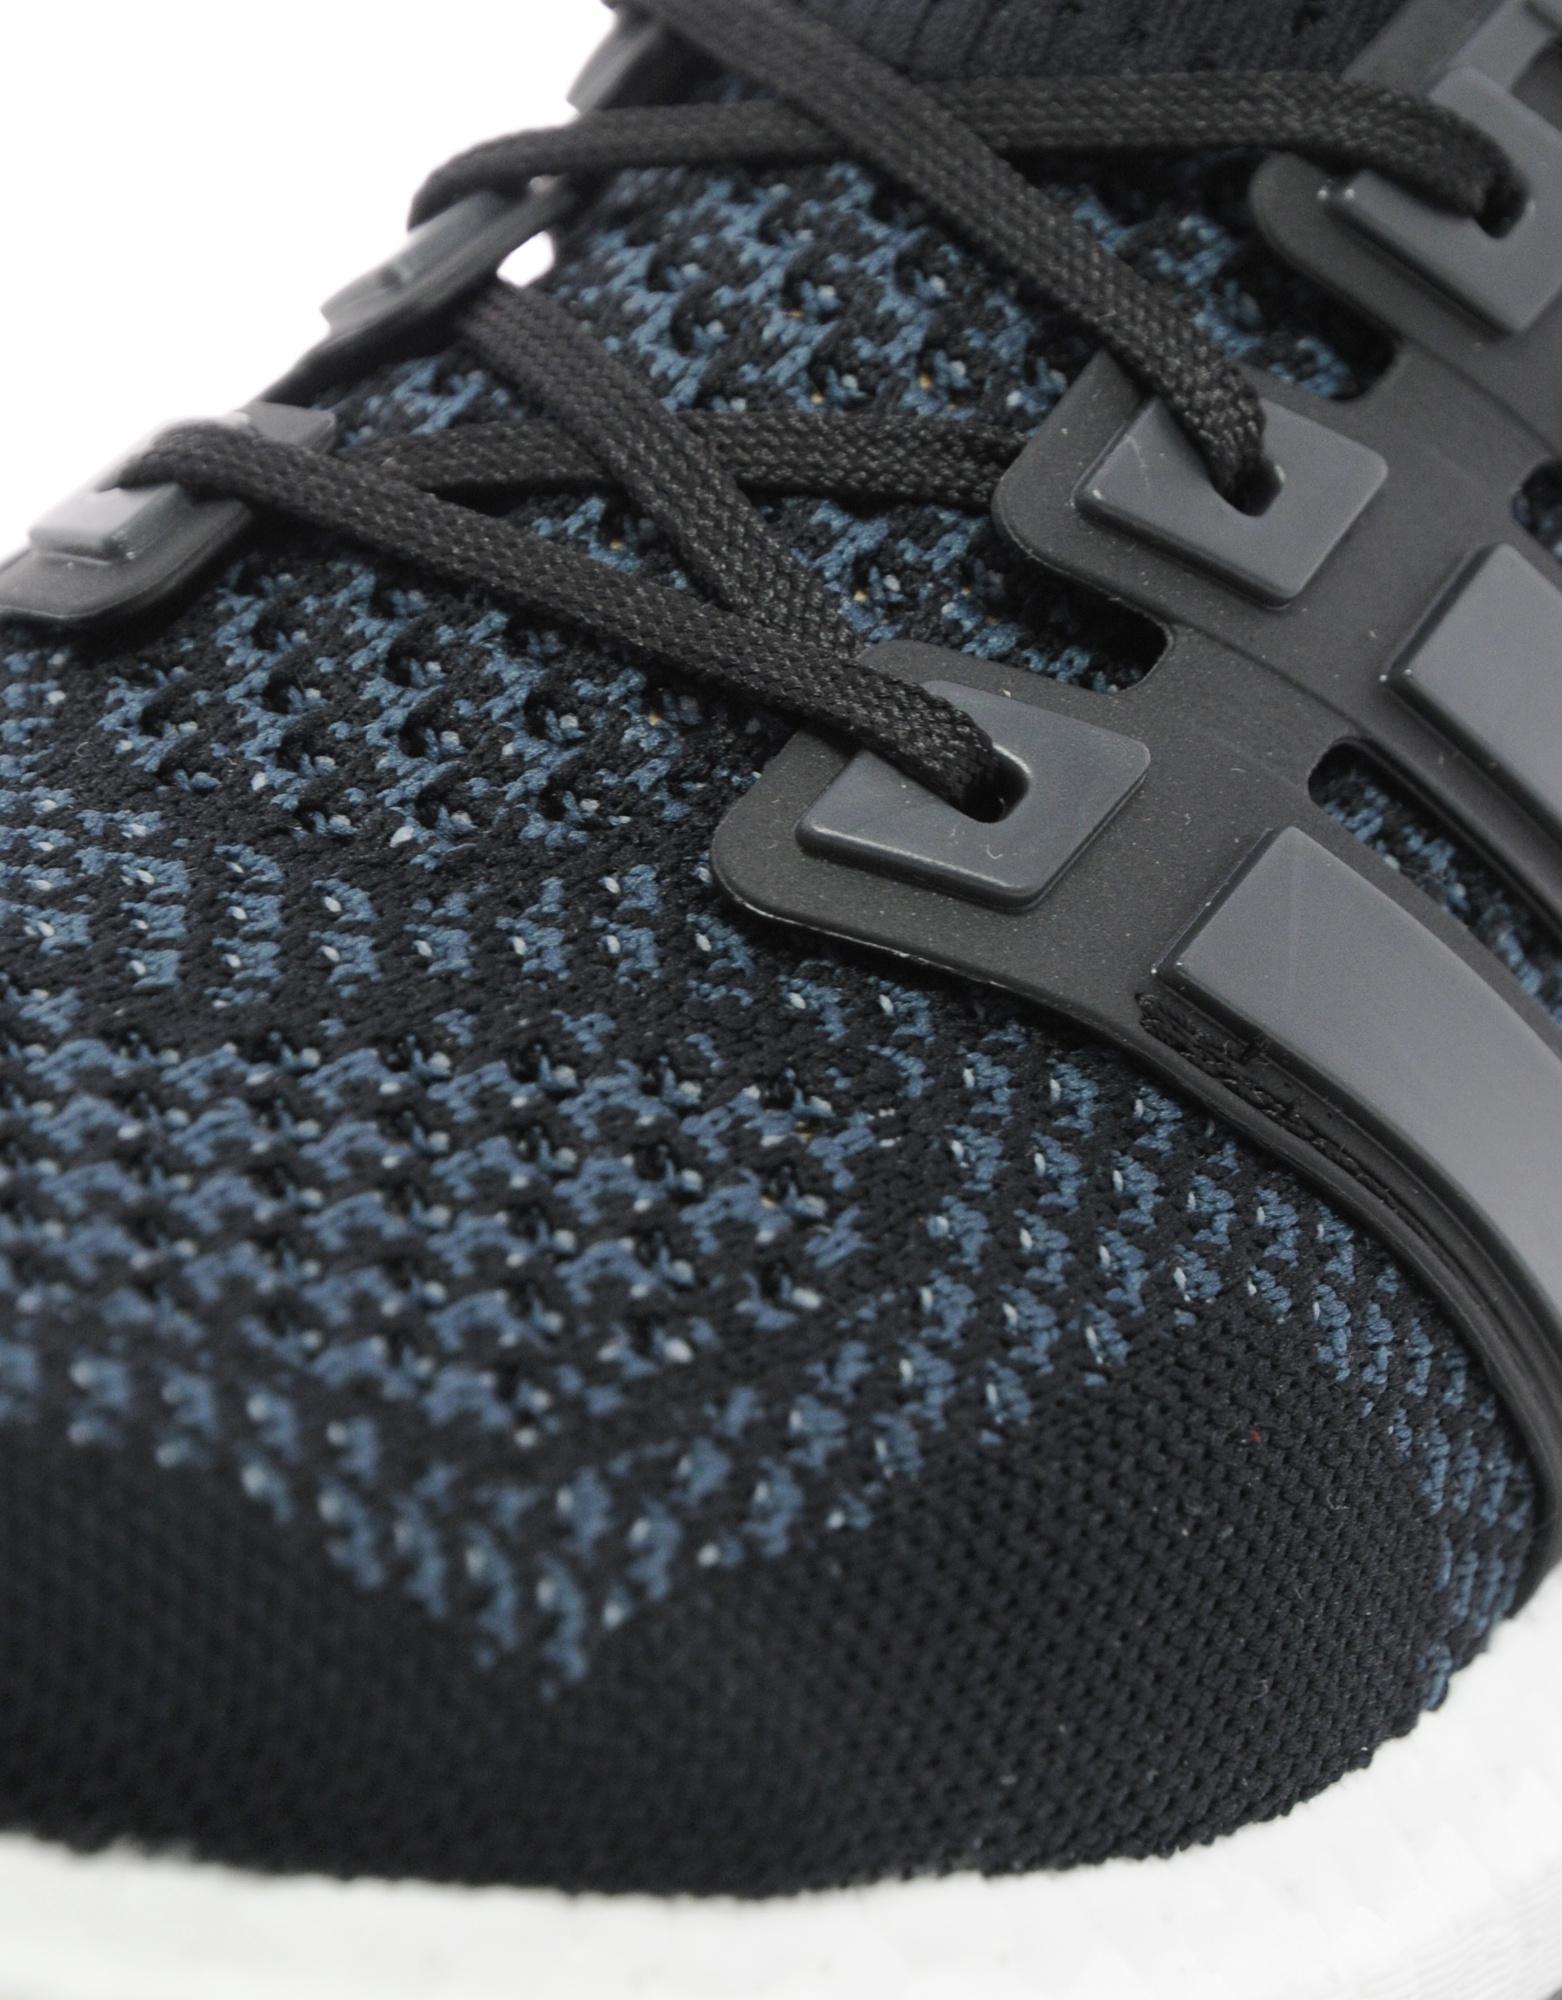 Adidas Ultra Boost Endless Energy